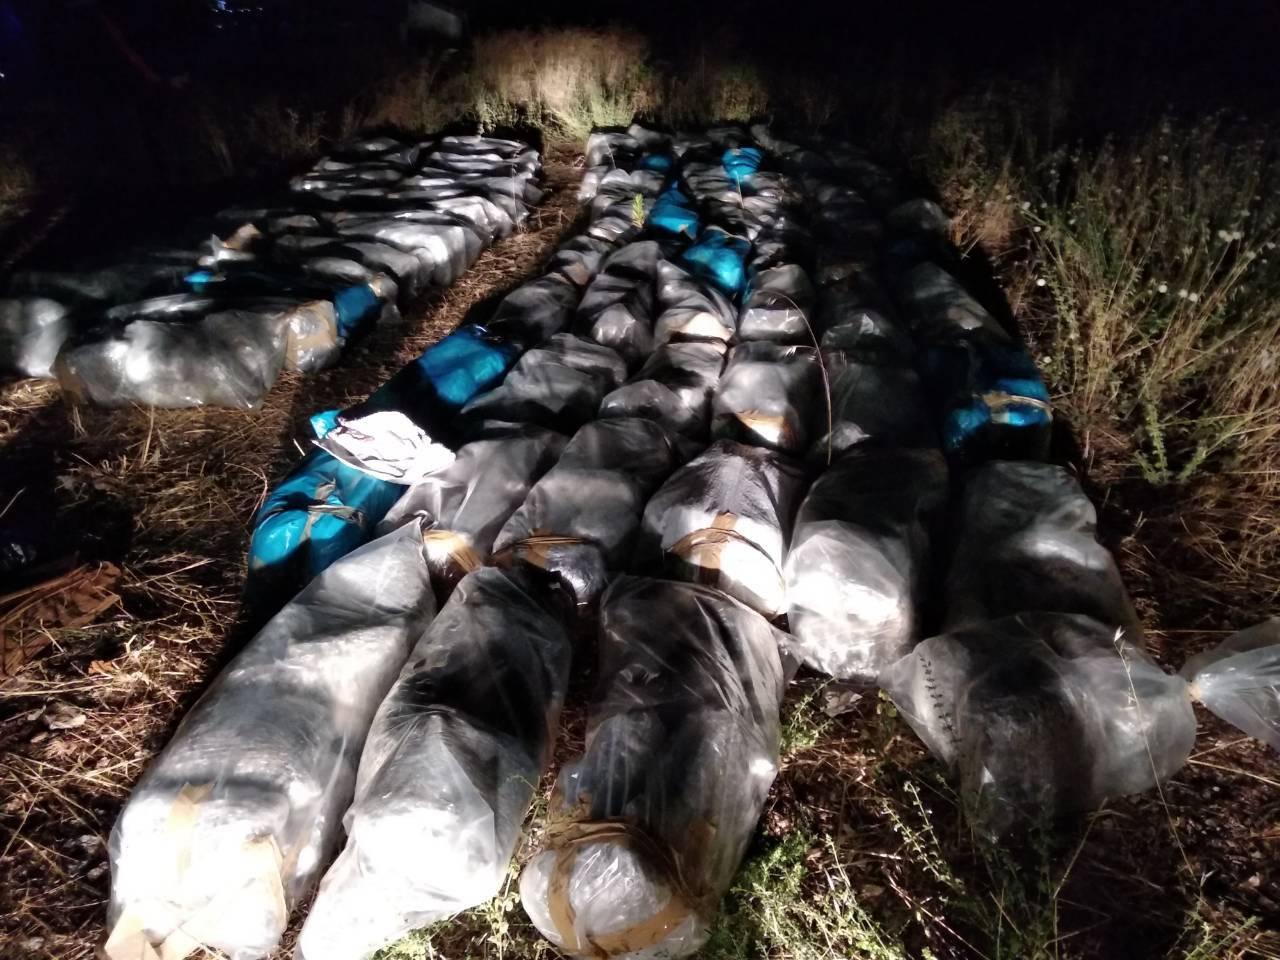 Zapljena u Neumu: Cisterna je prevozila čak 665 kg  'skunka'!